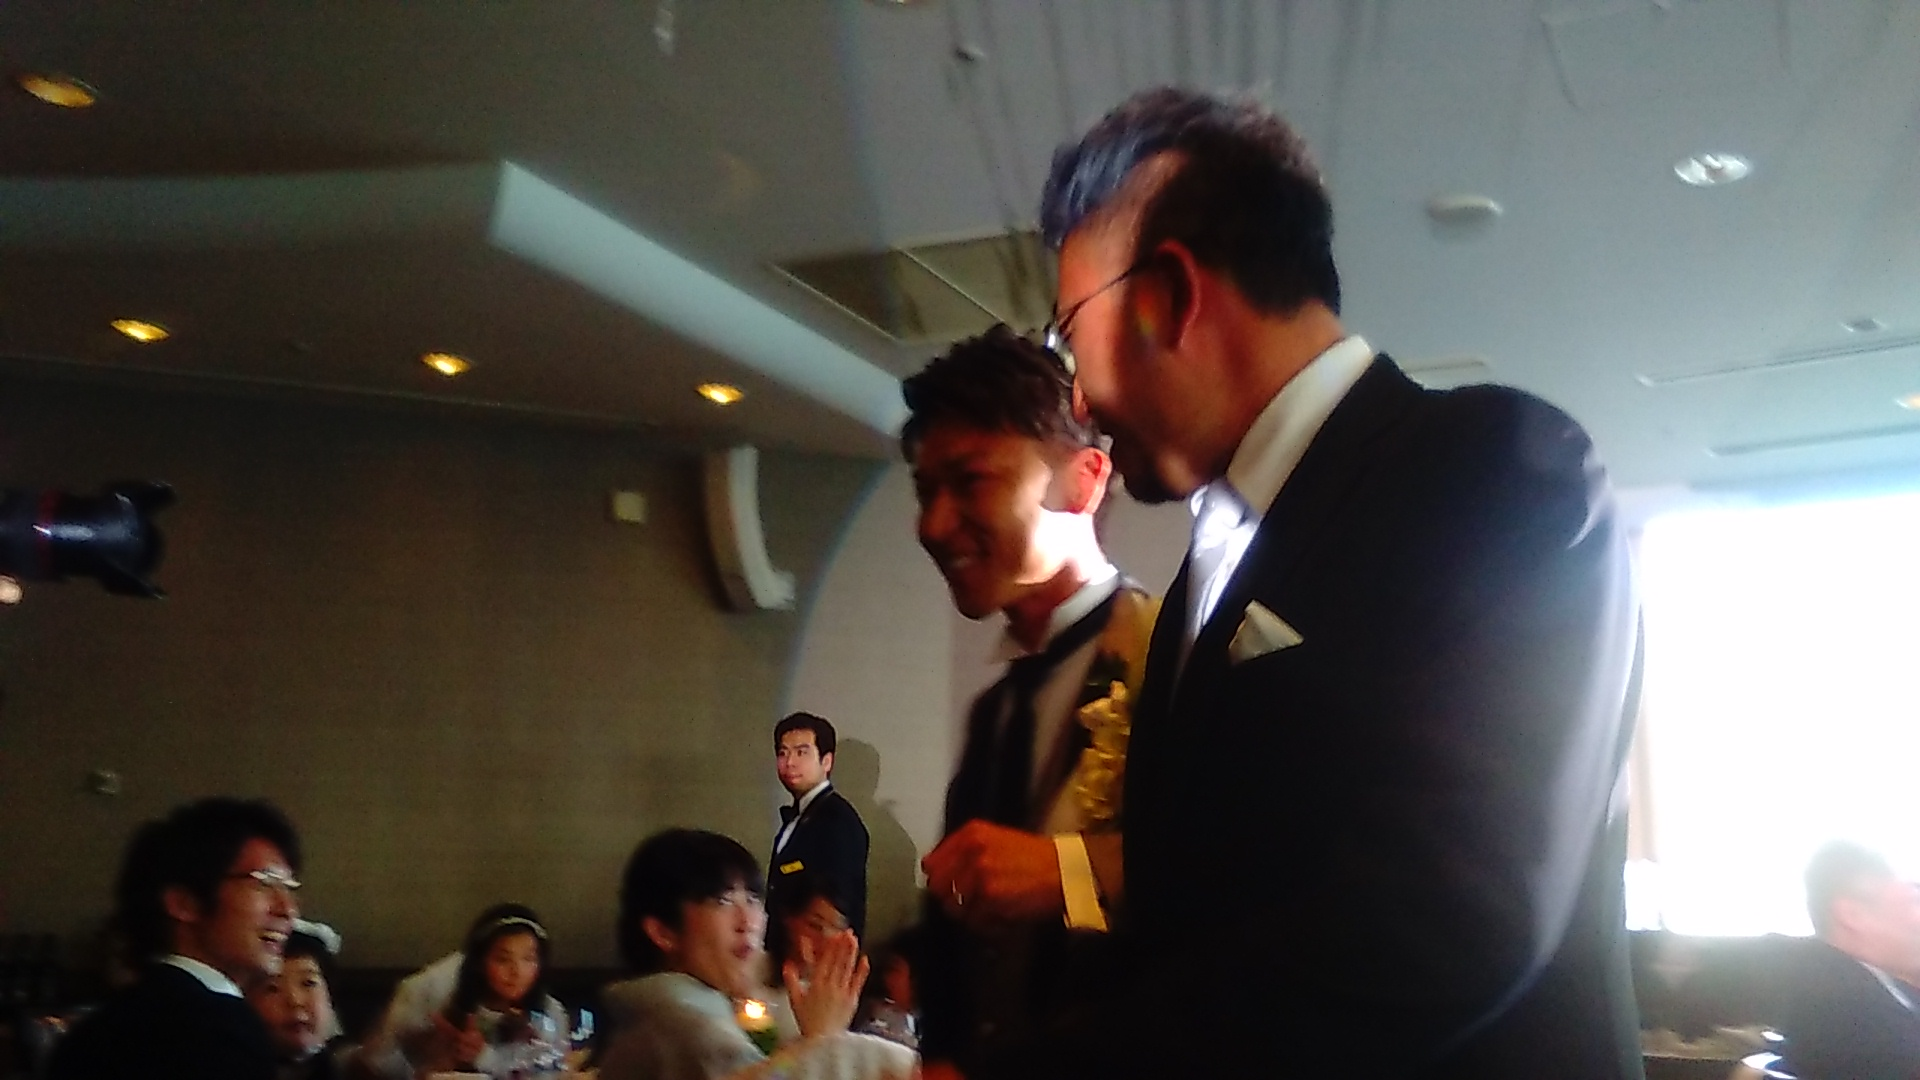 KIMG0671 - 結婚式